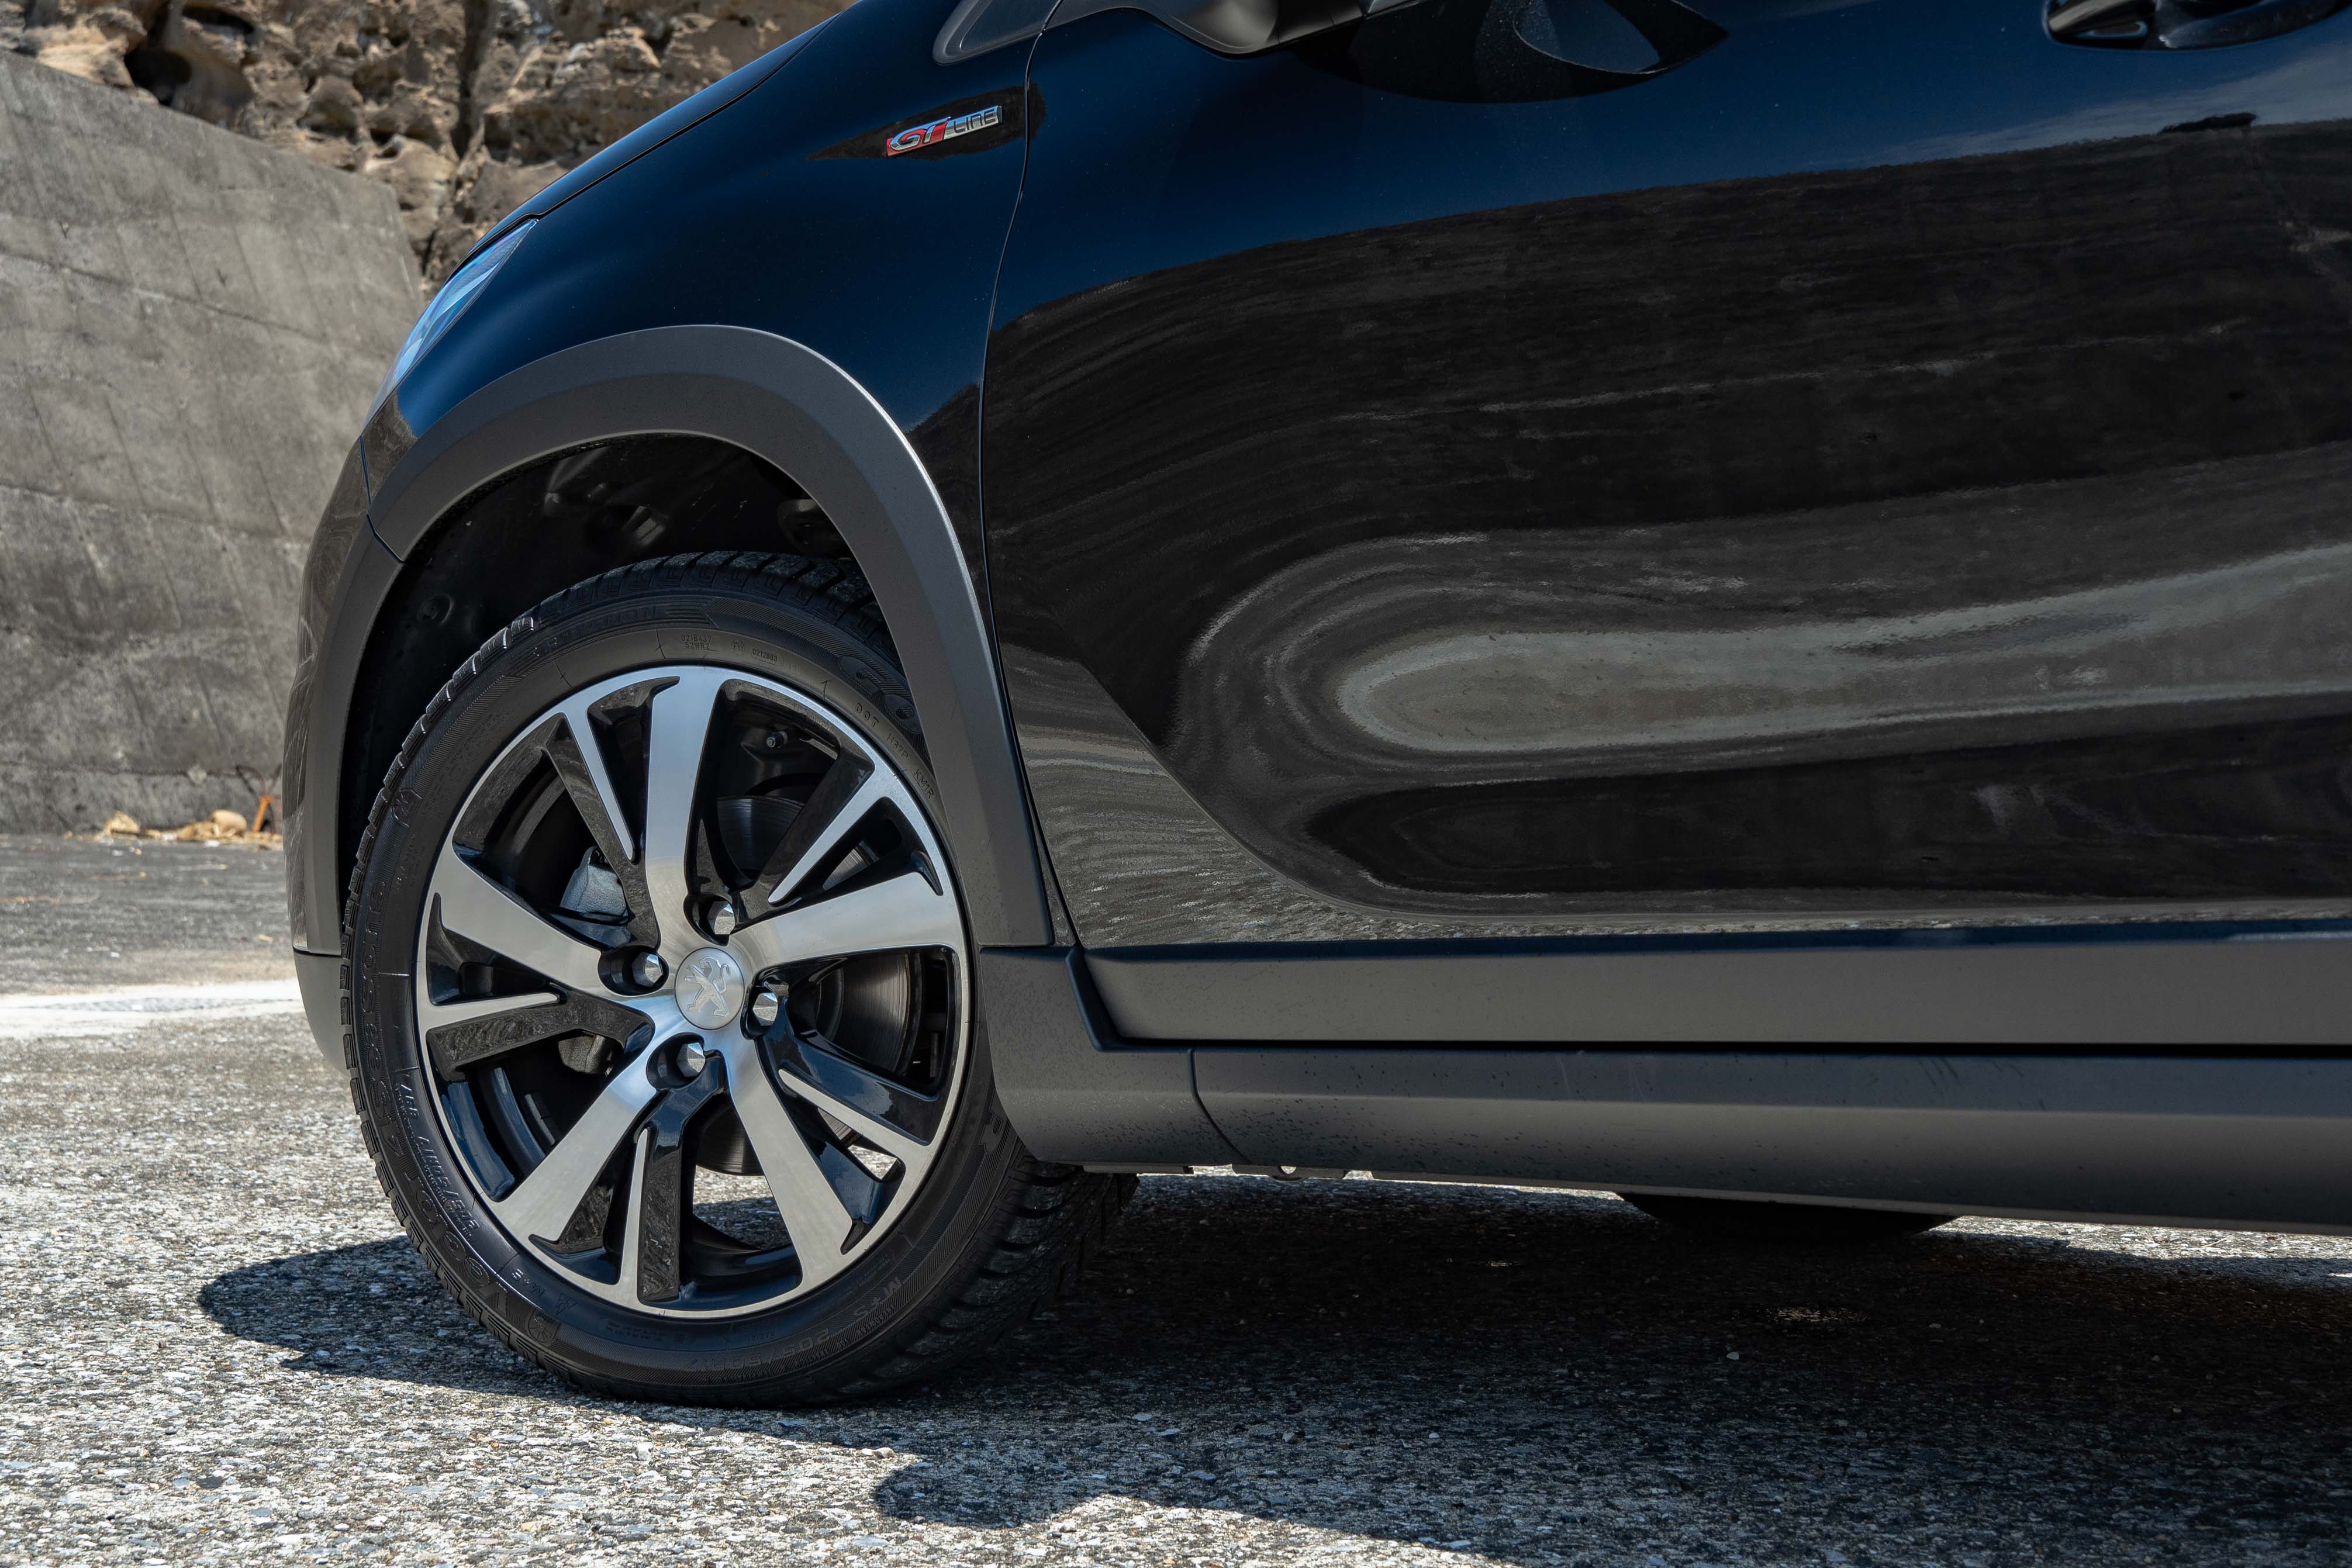 GT Line 標配 17 吋輕量化鋁合金輪圈。